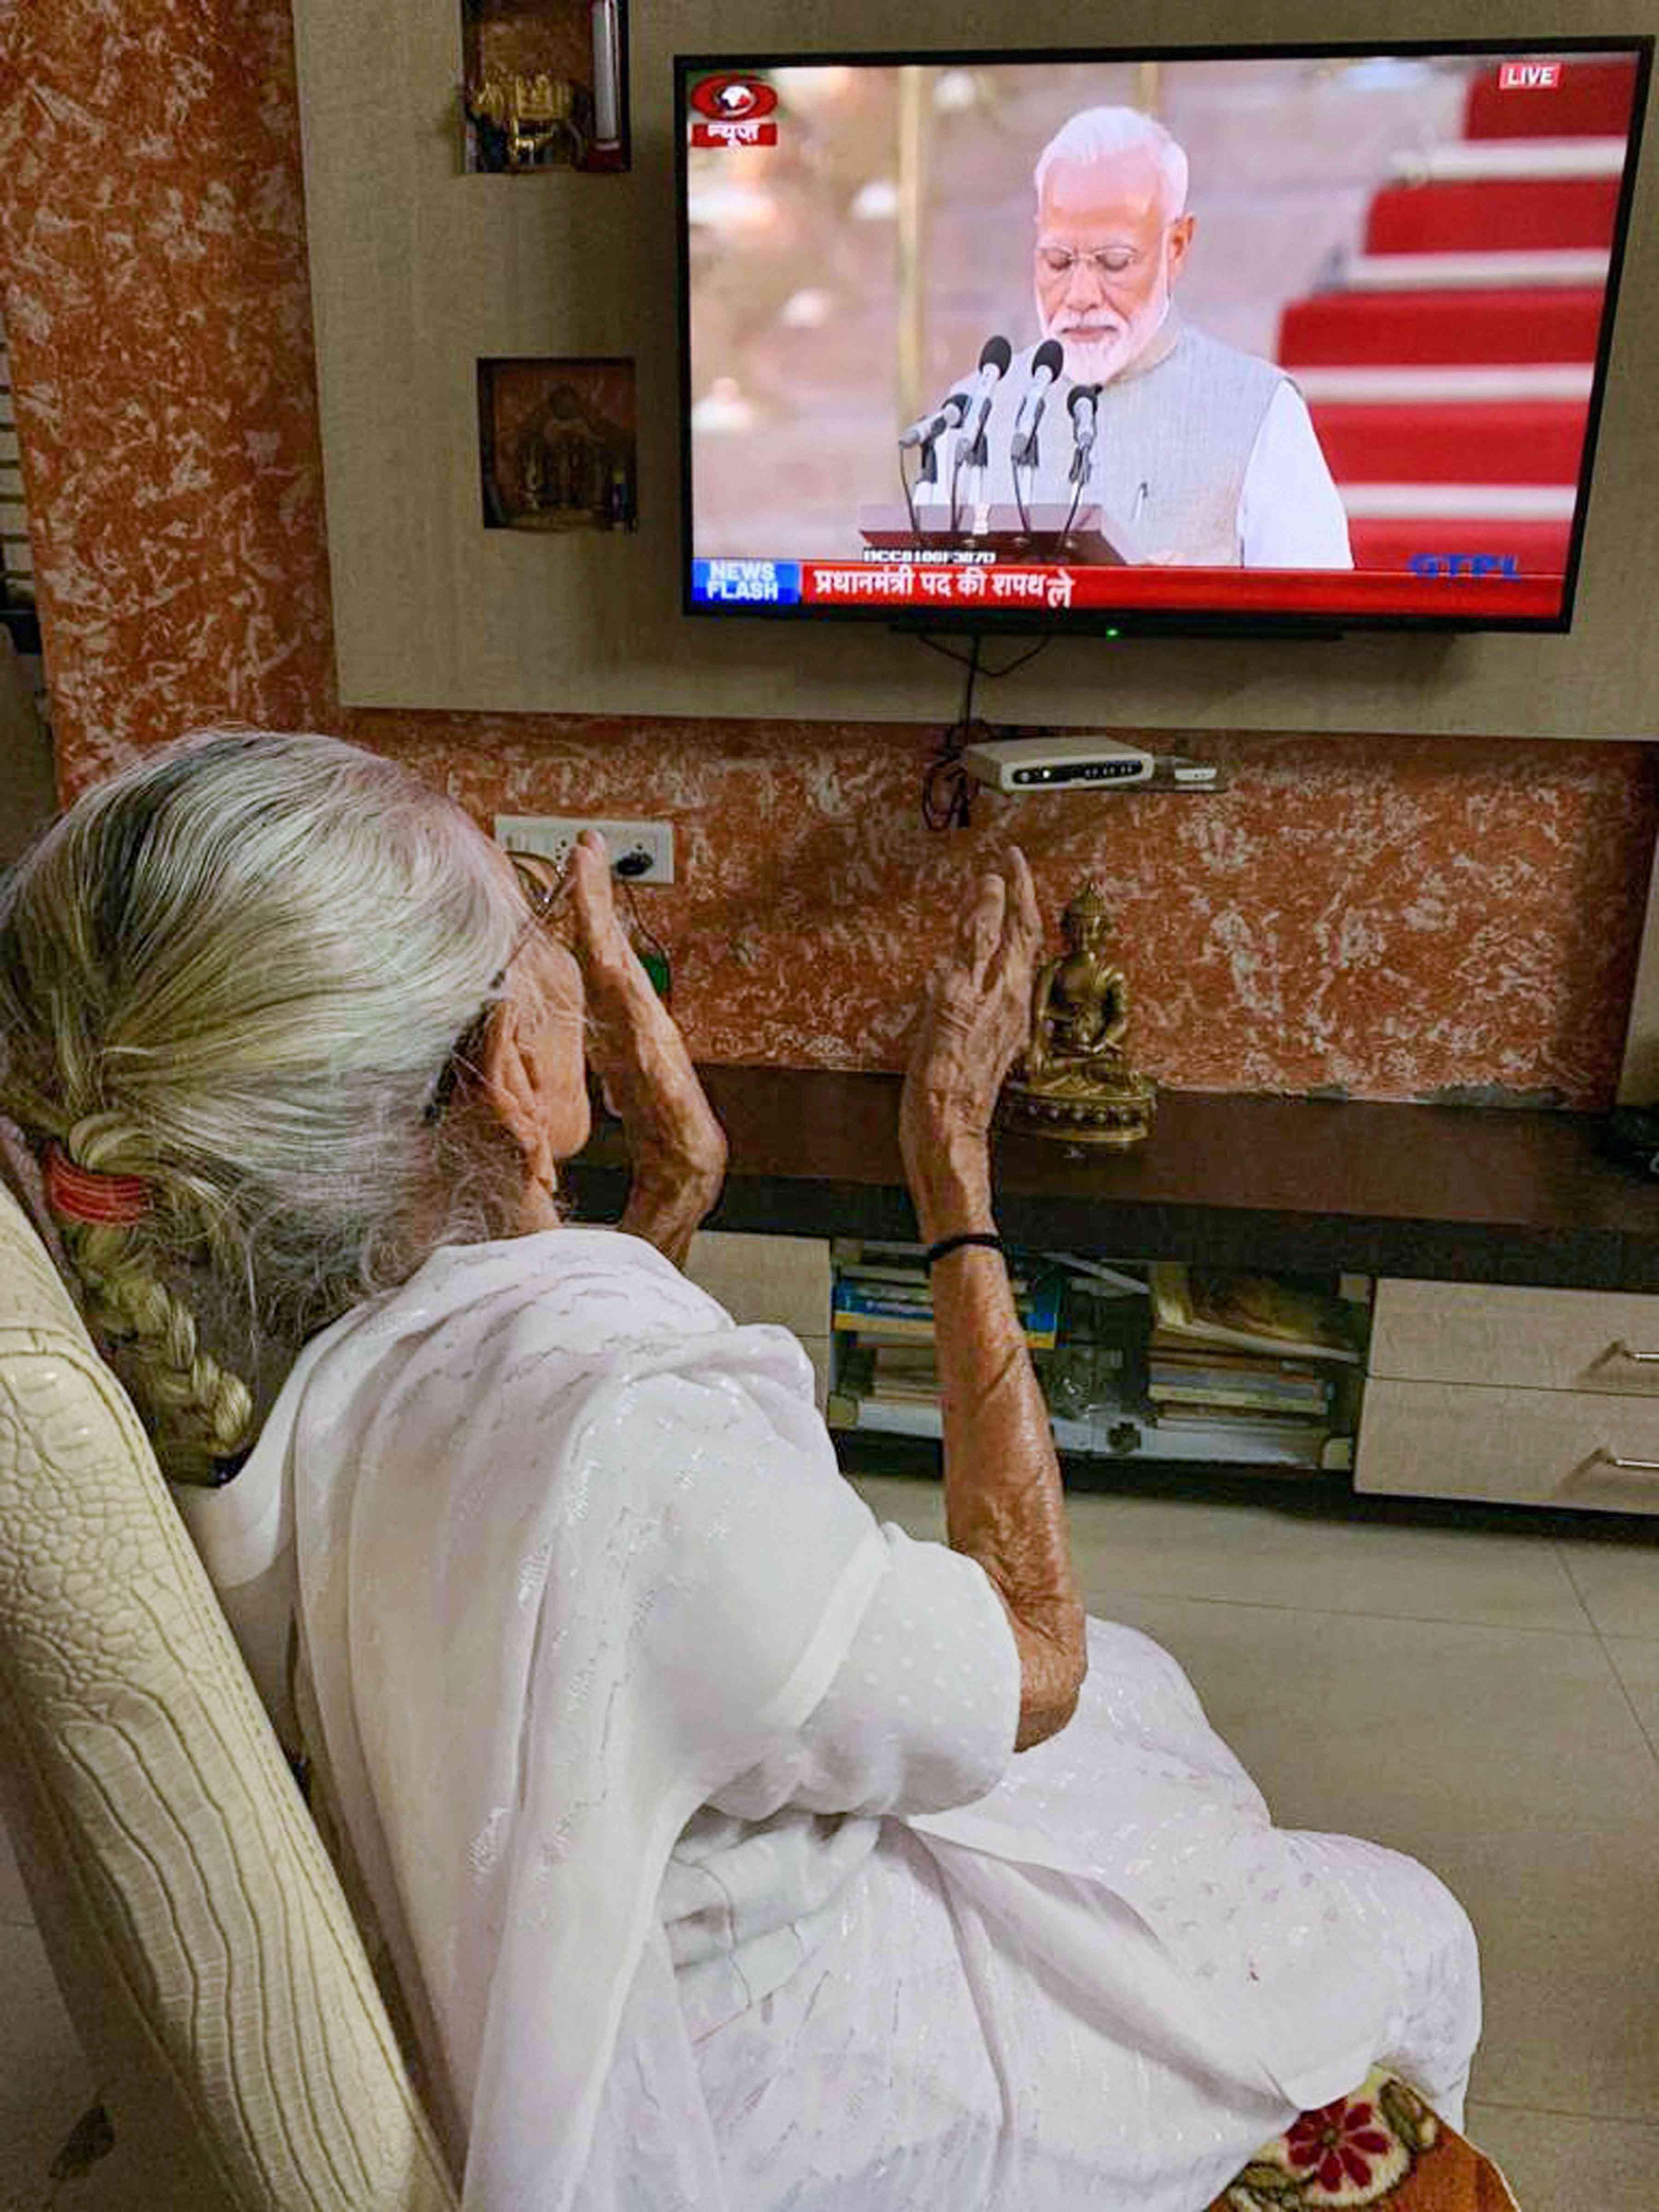 Prime Minister Narendra Modi's mother Heeraben Modi watches him on television at her home in Gujarat's capital Gandhinagar. (Image Credit: PTI)